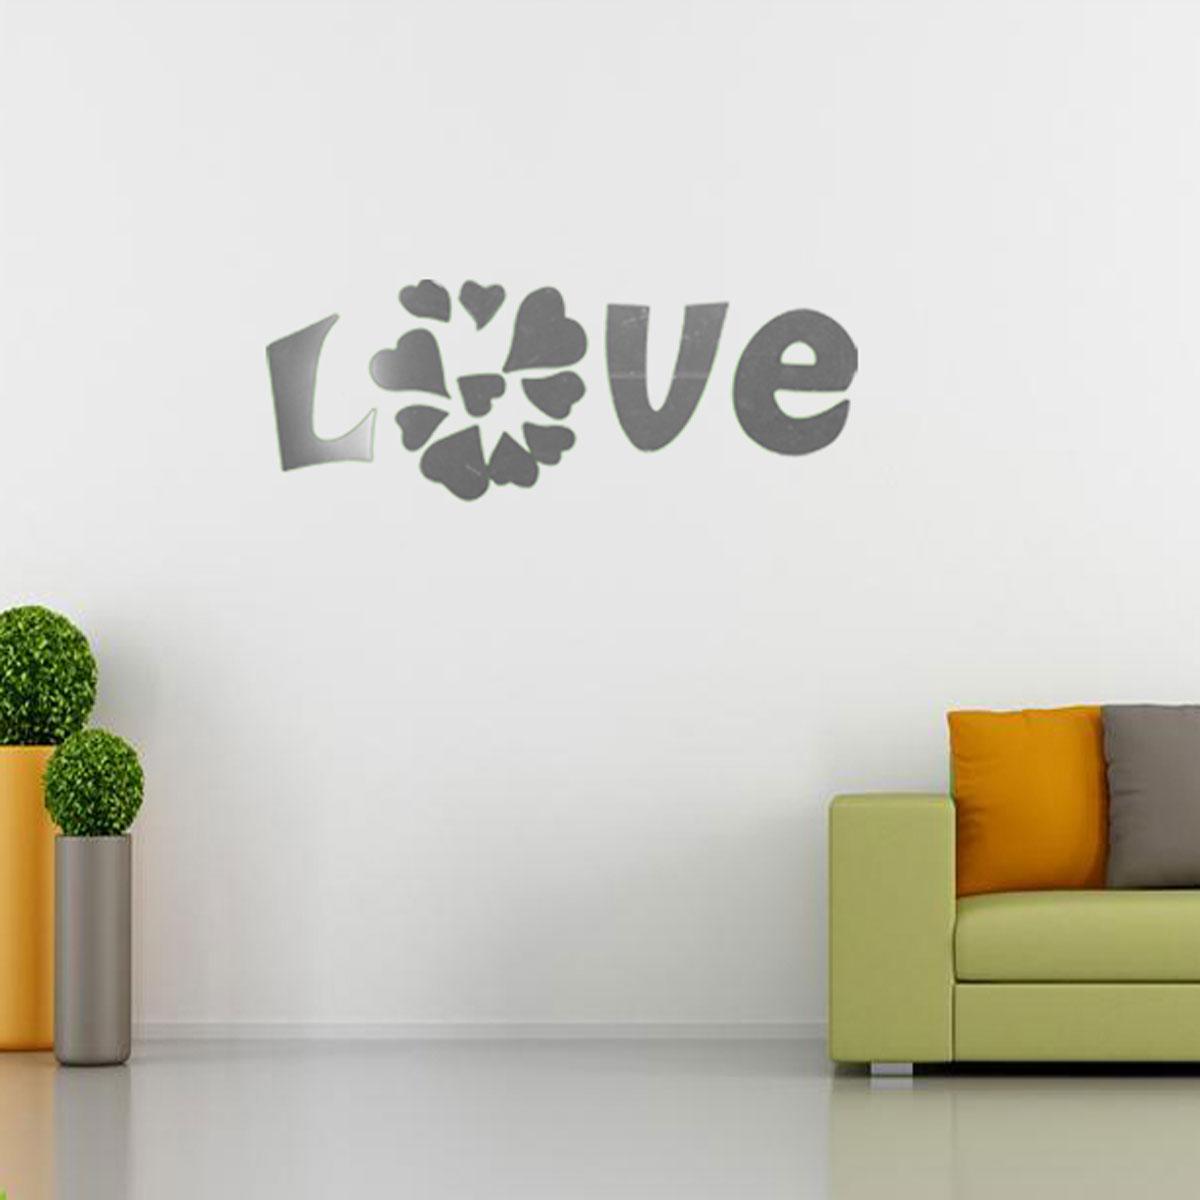 Diy love modern acrylic mirror effect wall sticker decal for Room decor lazada